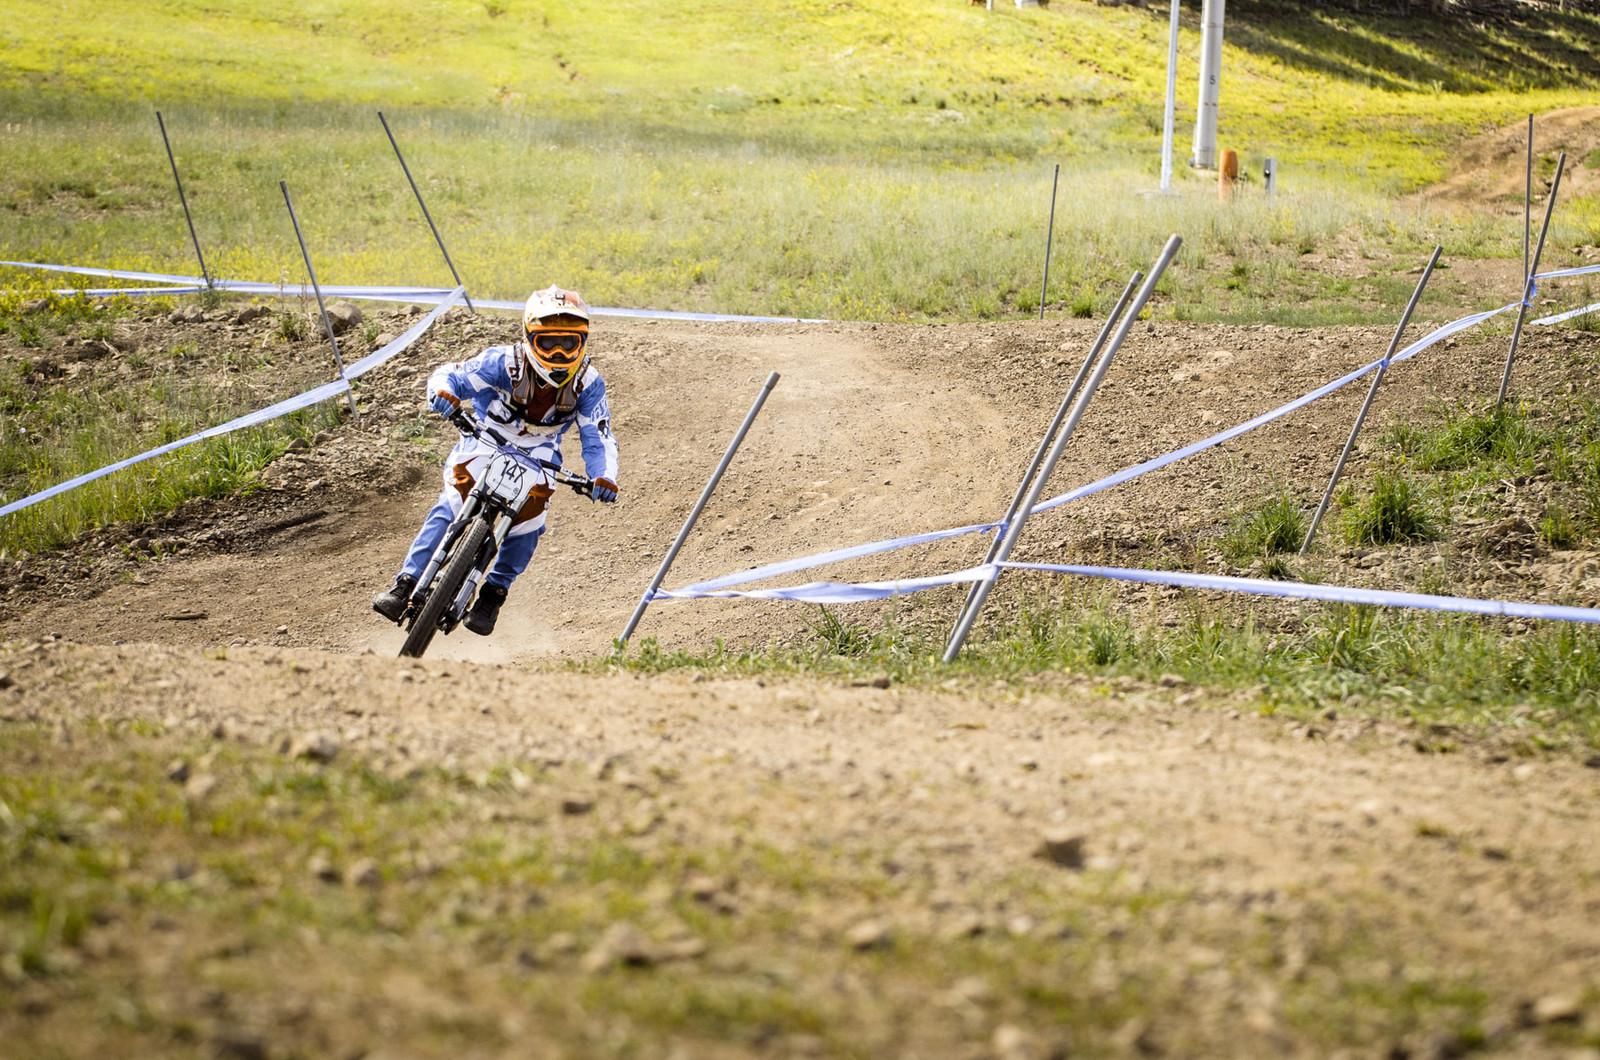 Joey Foresta Junior 11-12 National Downhill Champion - U.S. National Championship Downhill Finals Photos - Mountain Biking Pictures - Vital MTB